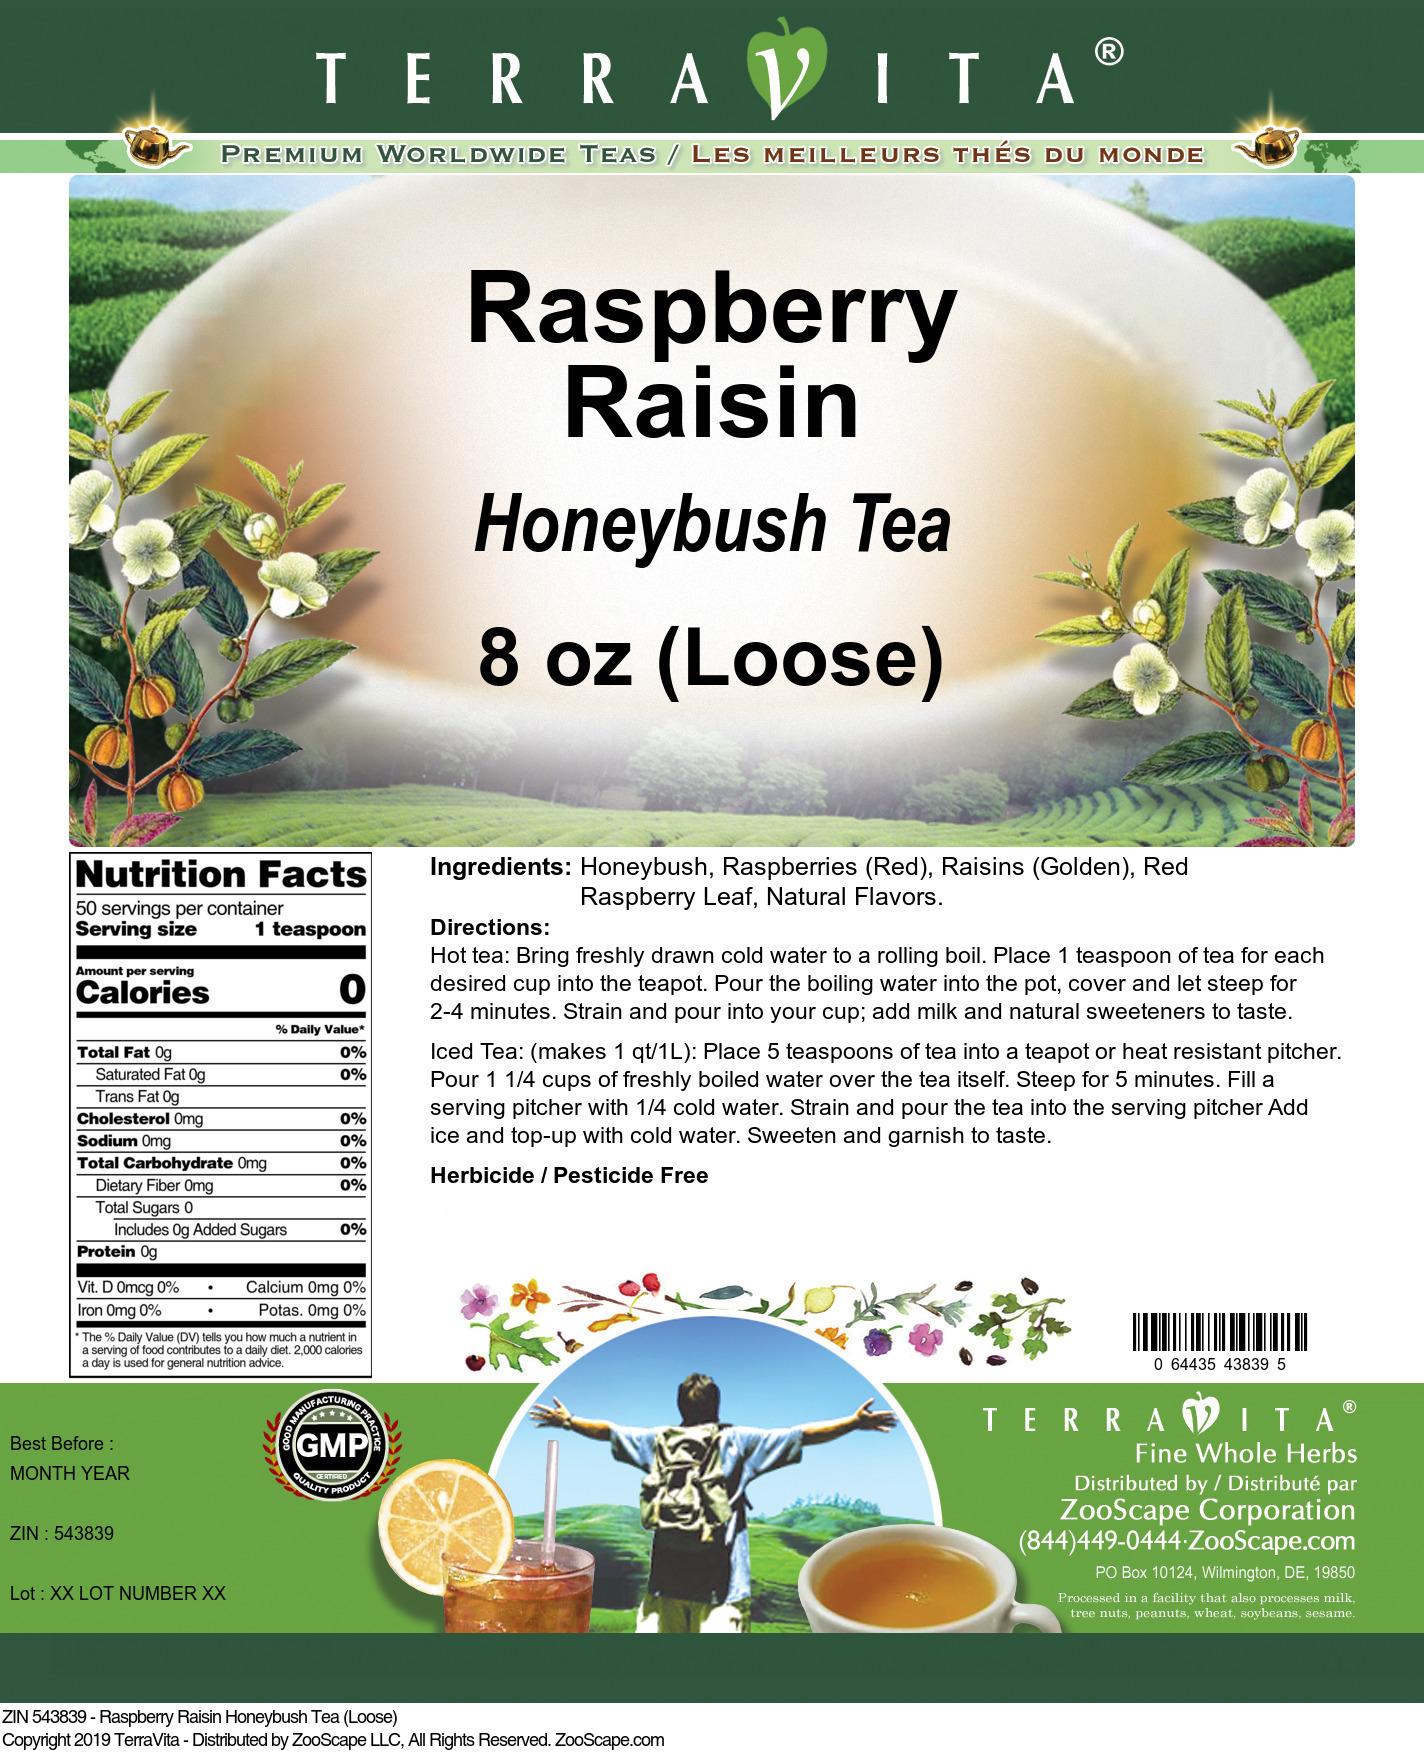 Raspberry Raisin Honeybush Tea